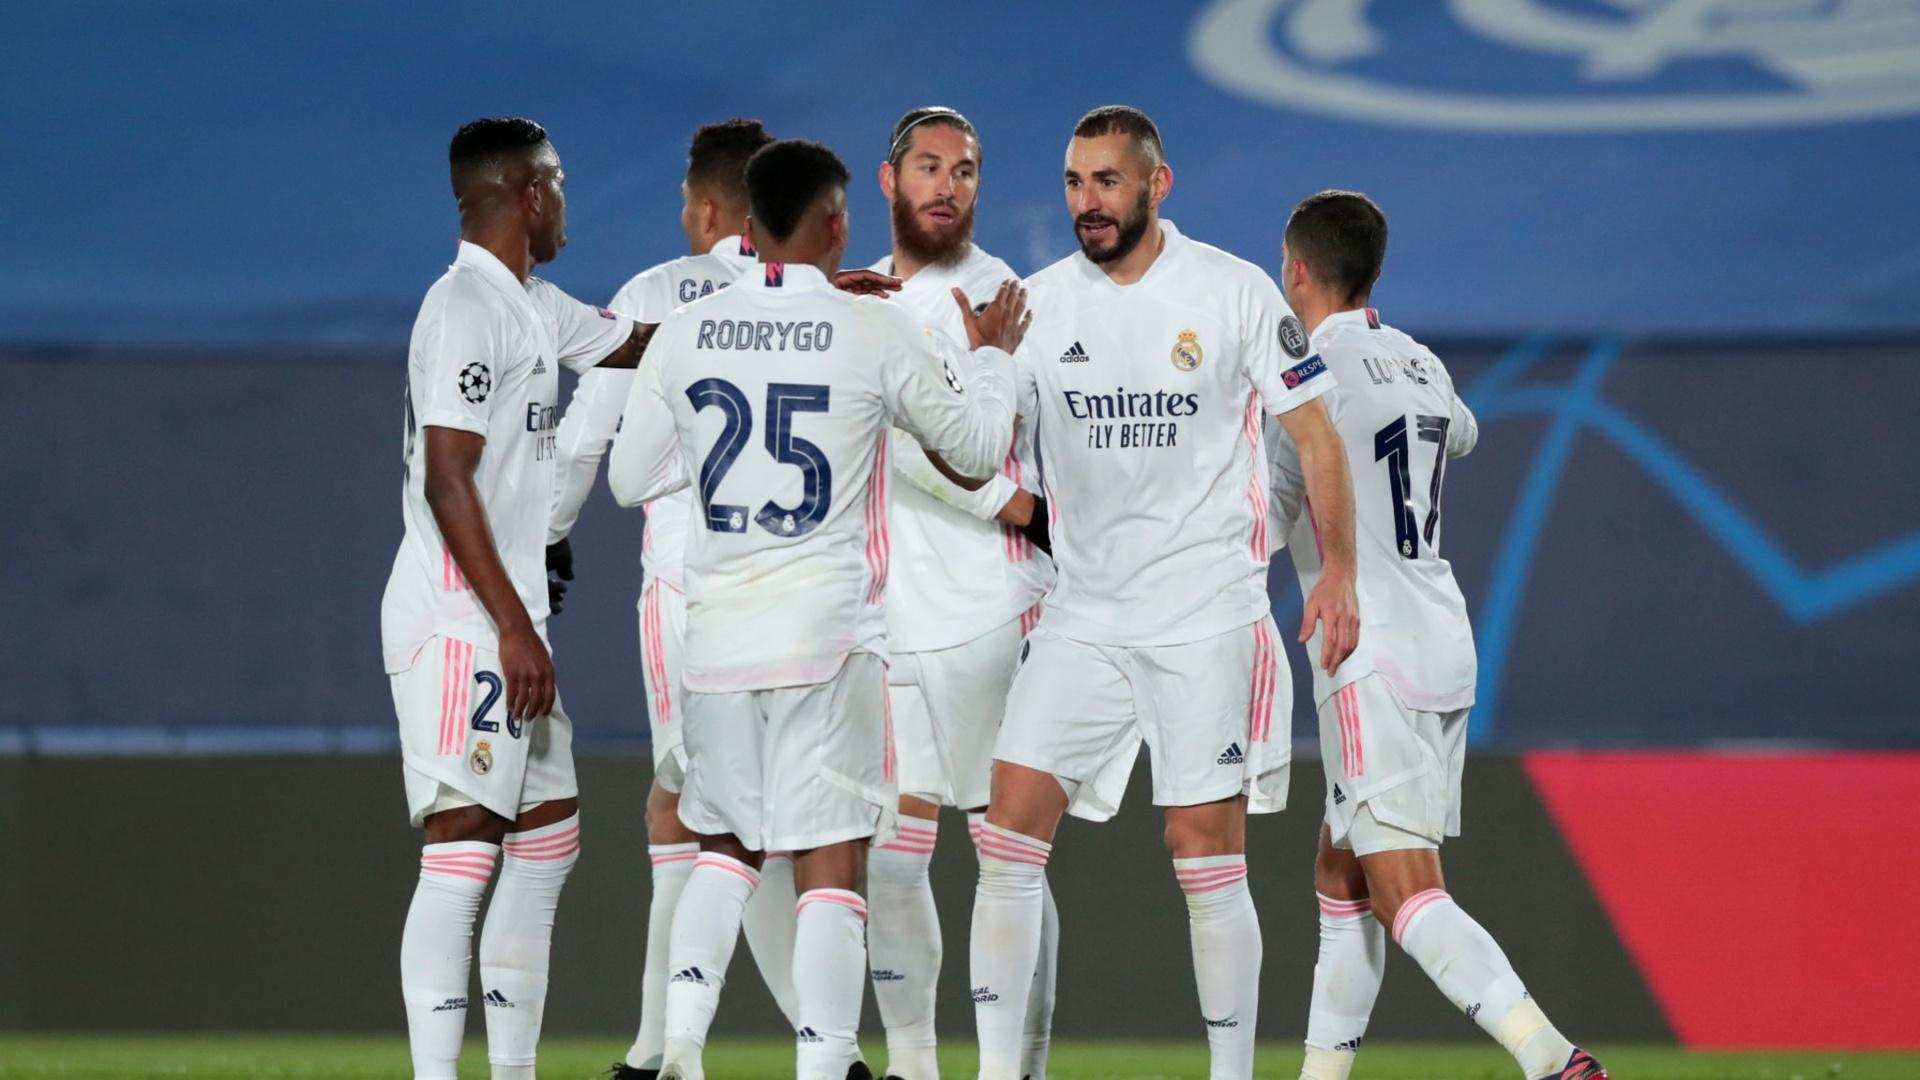 Match Report: Real Madrid 2-0 Borussia Mönchengladbach